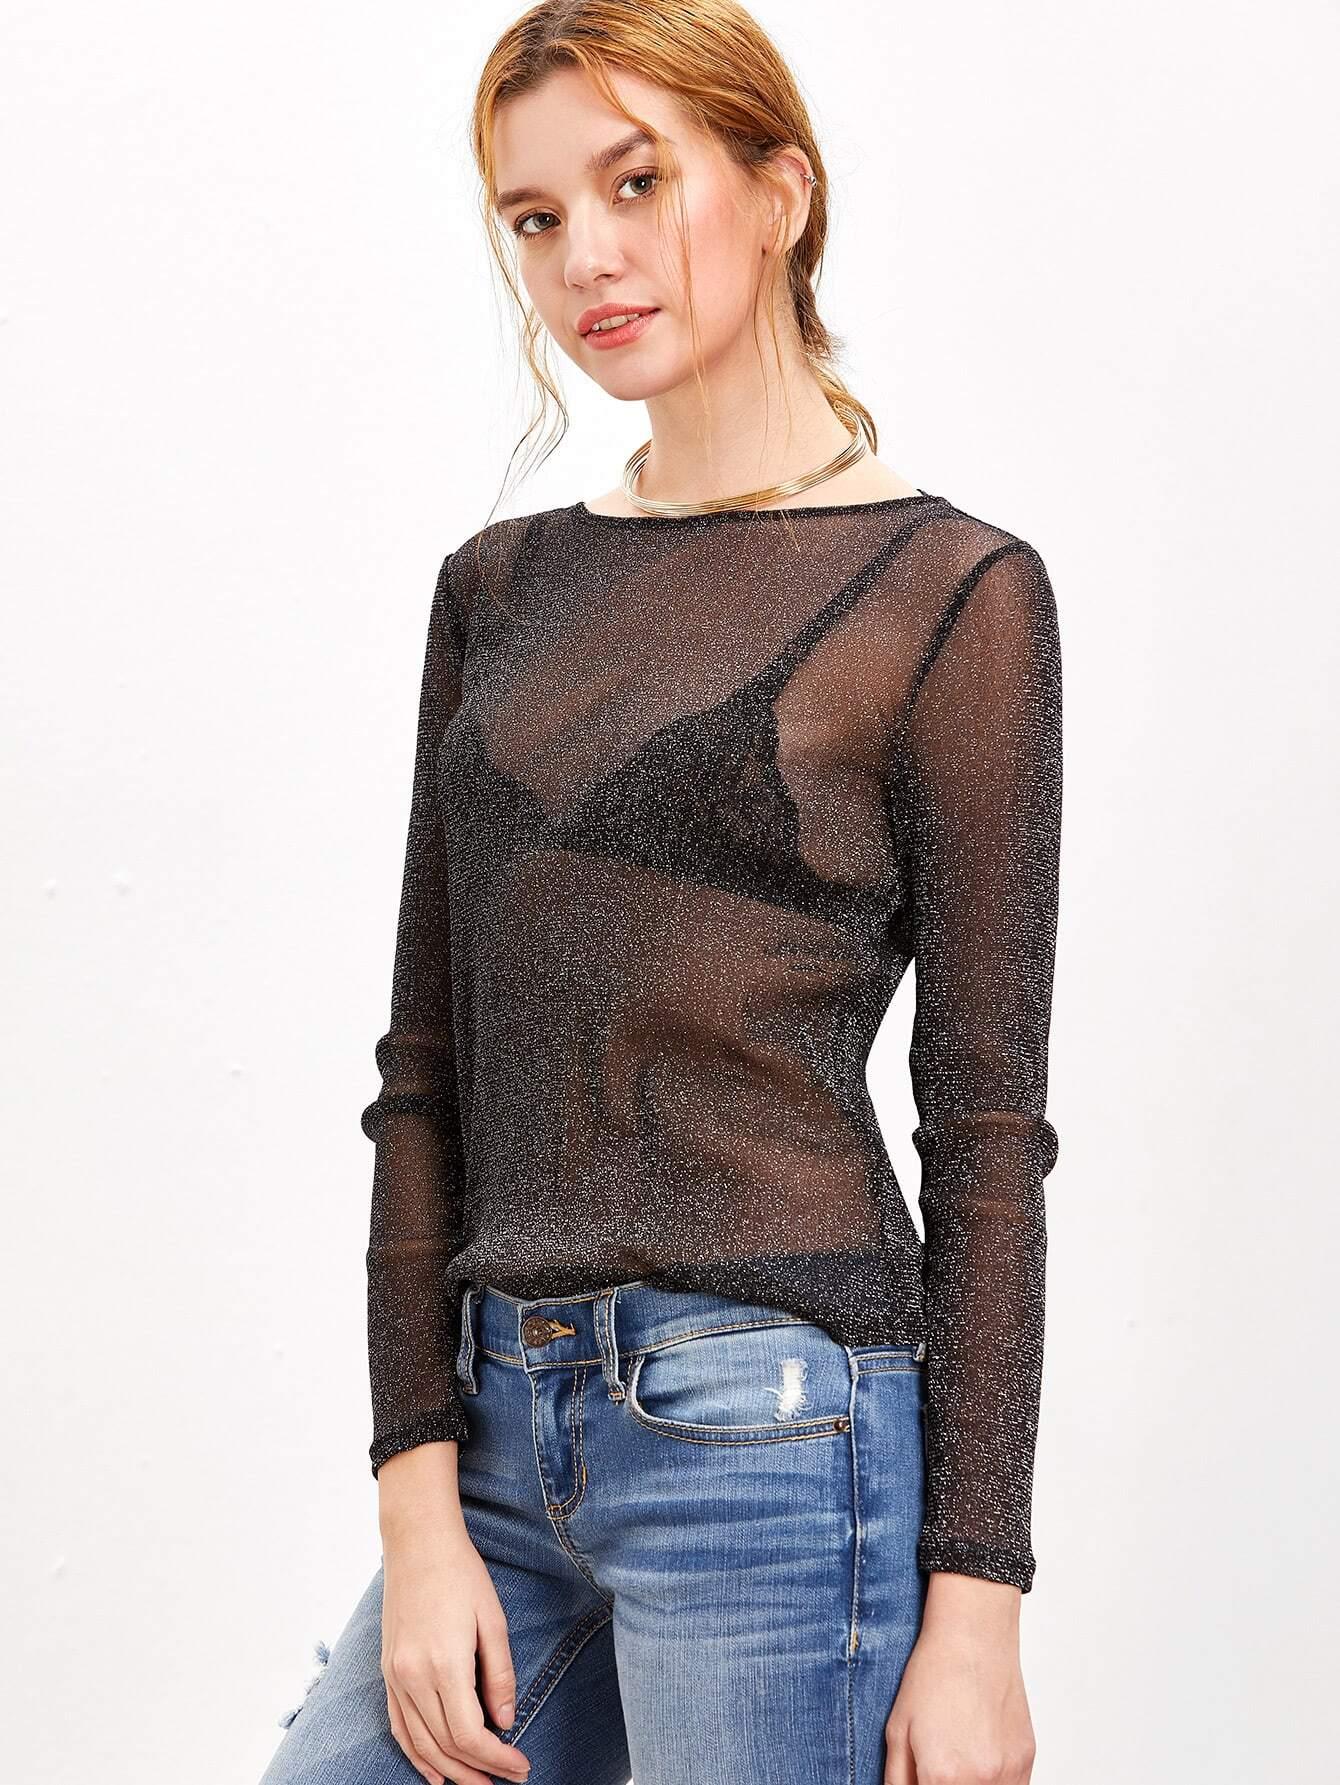 blouse161201702_2